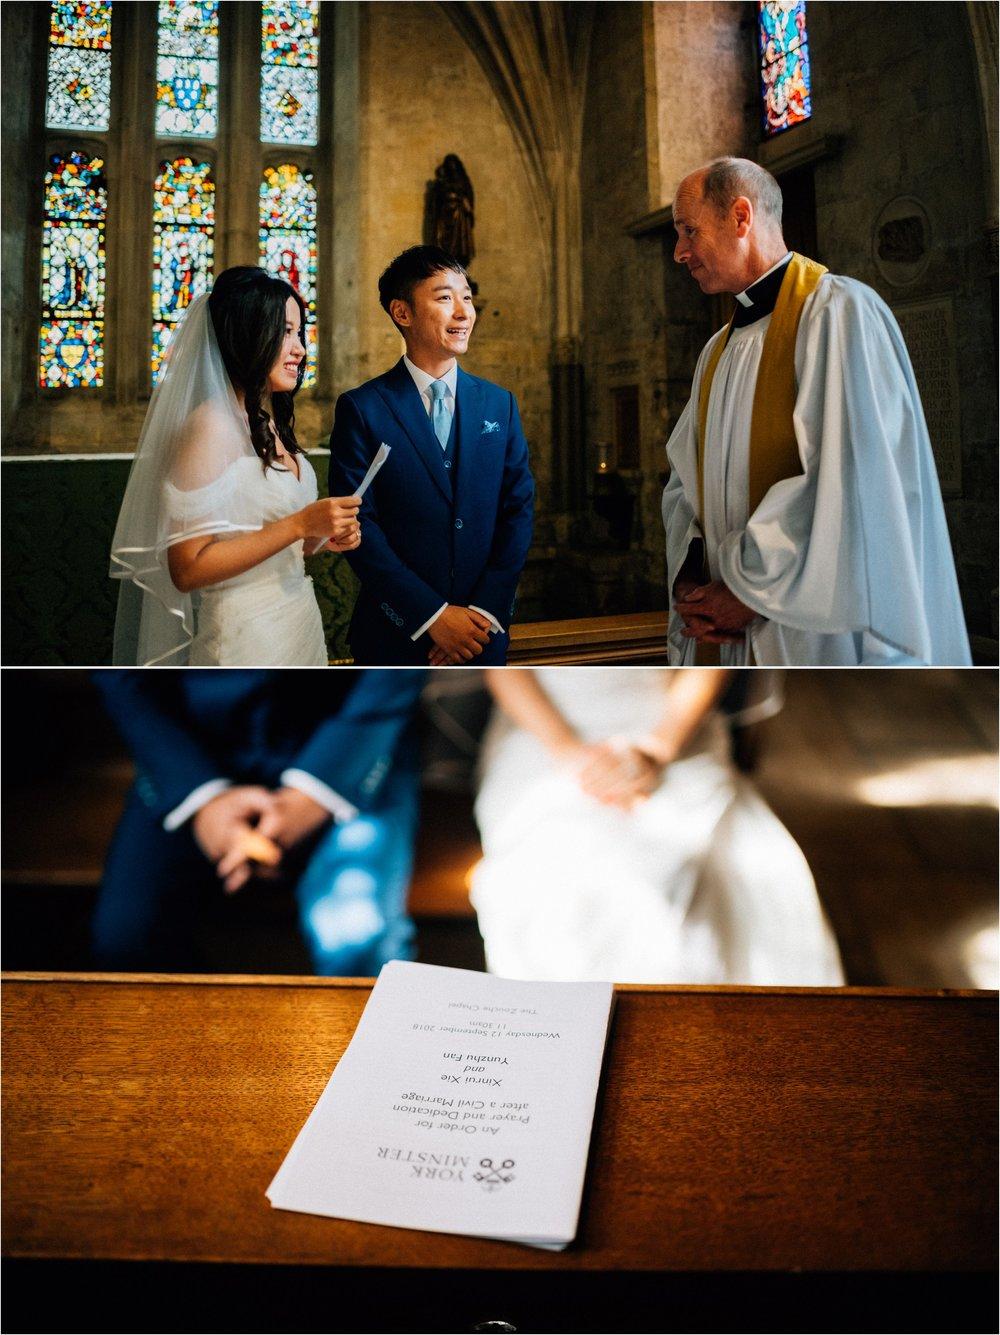 York city elopement wedding photographer_0131.jpg